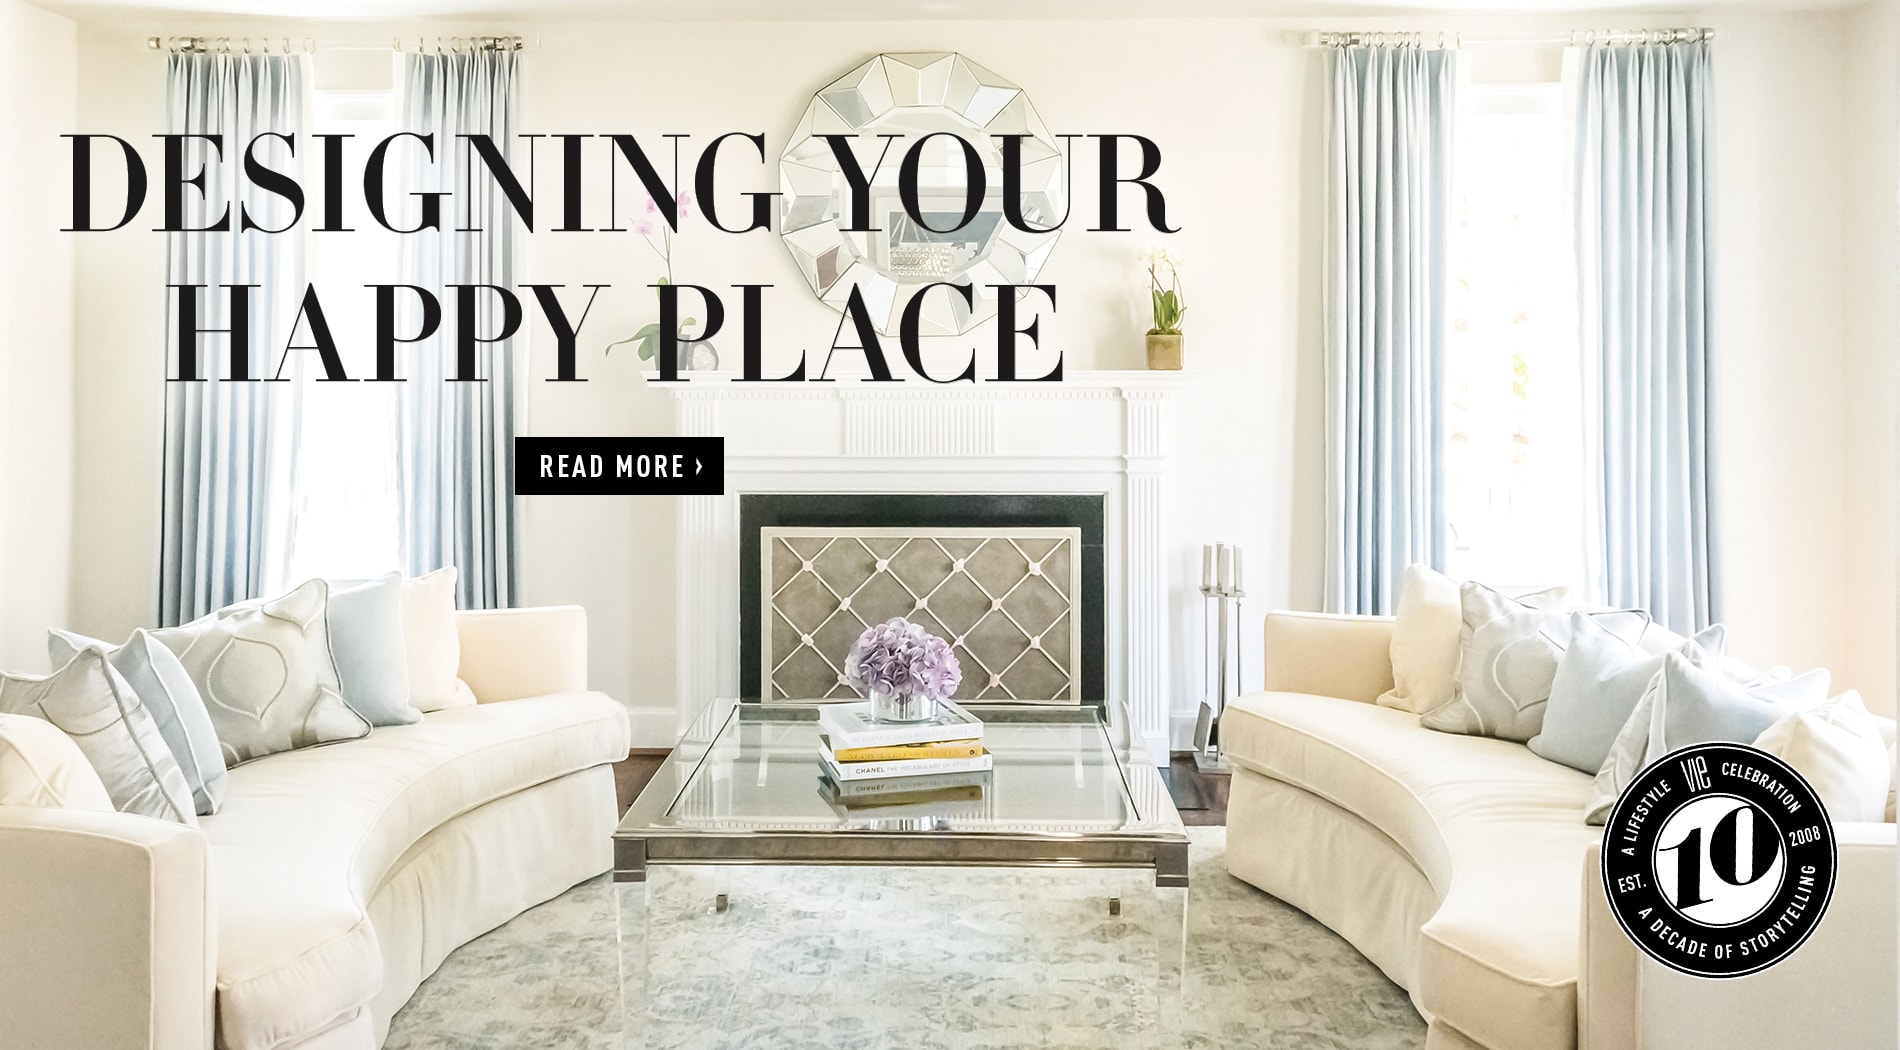 VIE Magazine - Home & Garden Issue - September 2018 - Summer House Lifestyle